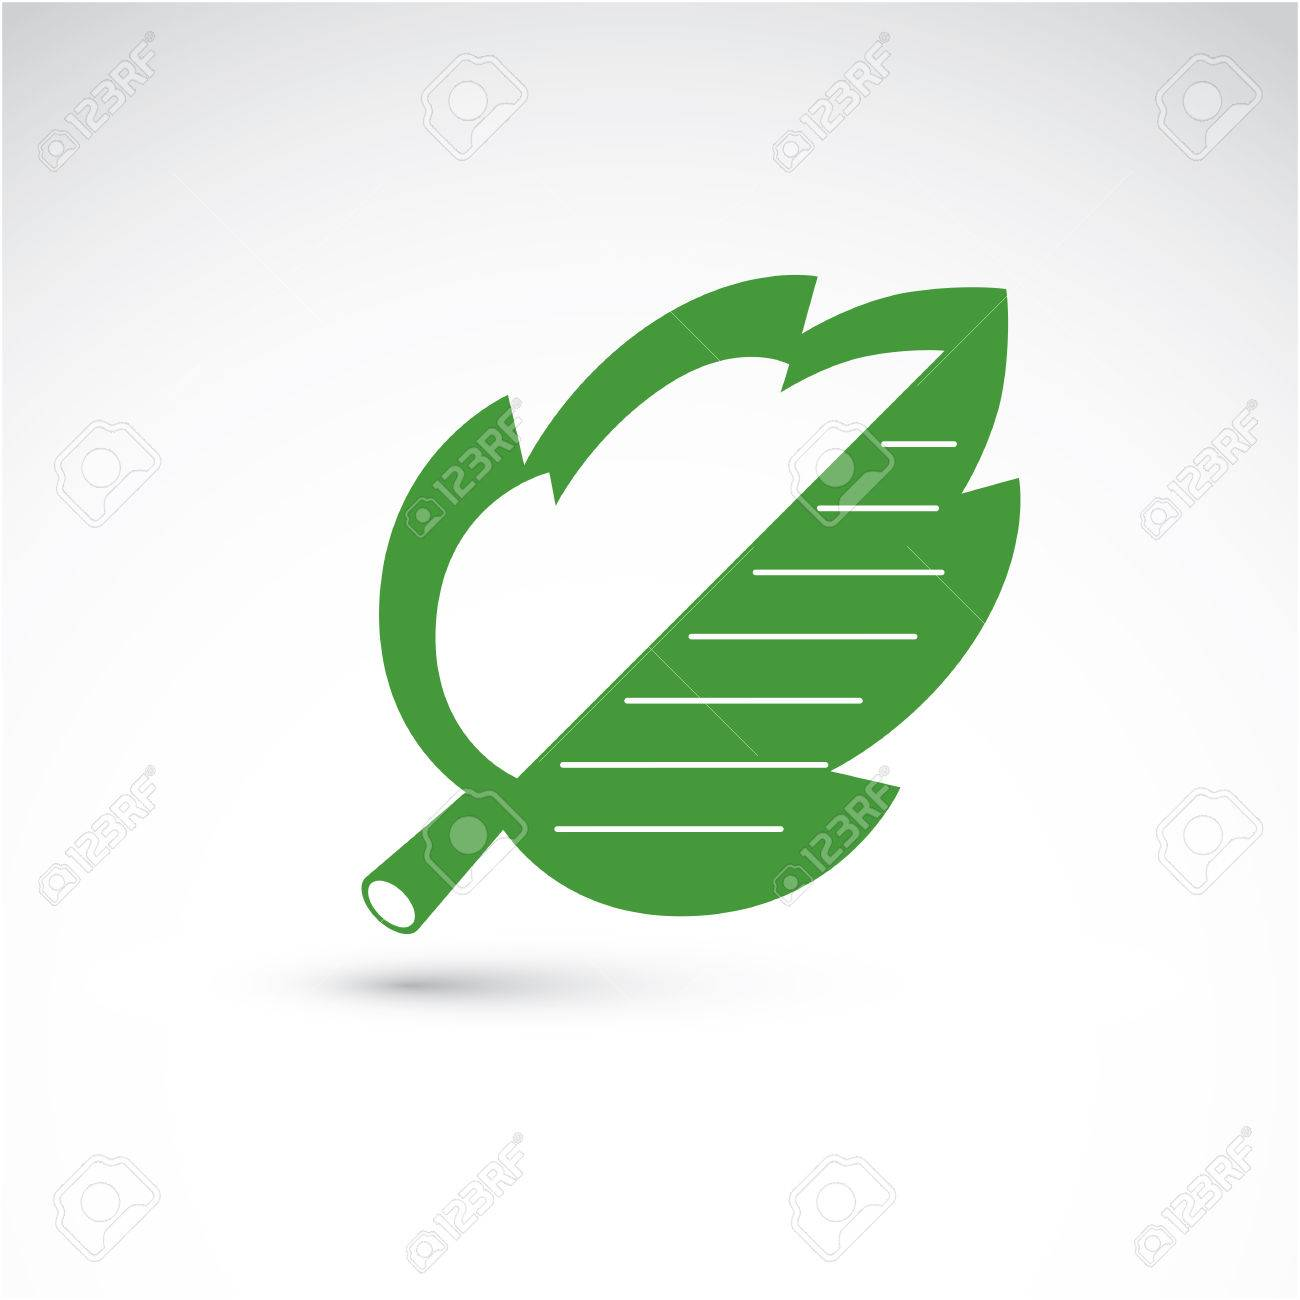 vector illustration of green hazel tree leaf isolated on white